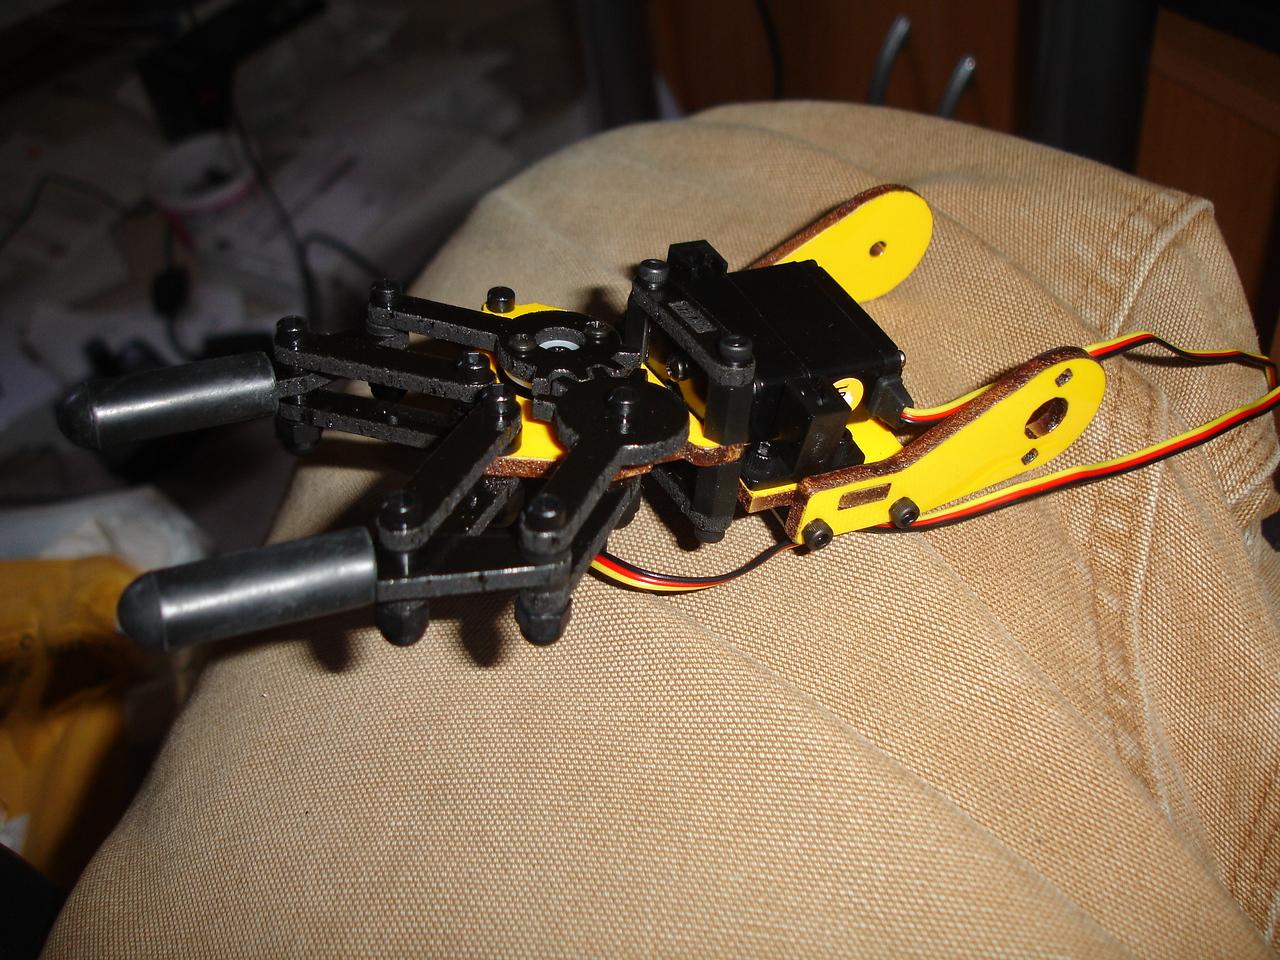 Gripper mechanism complete